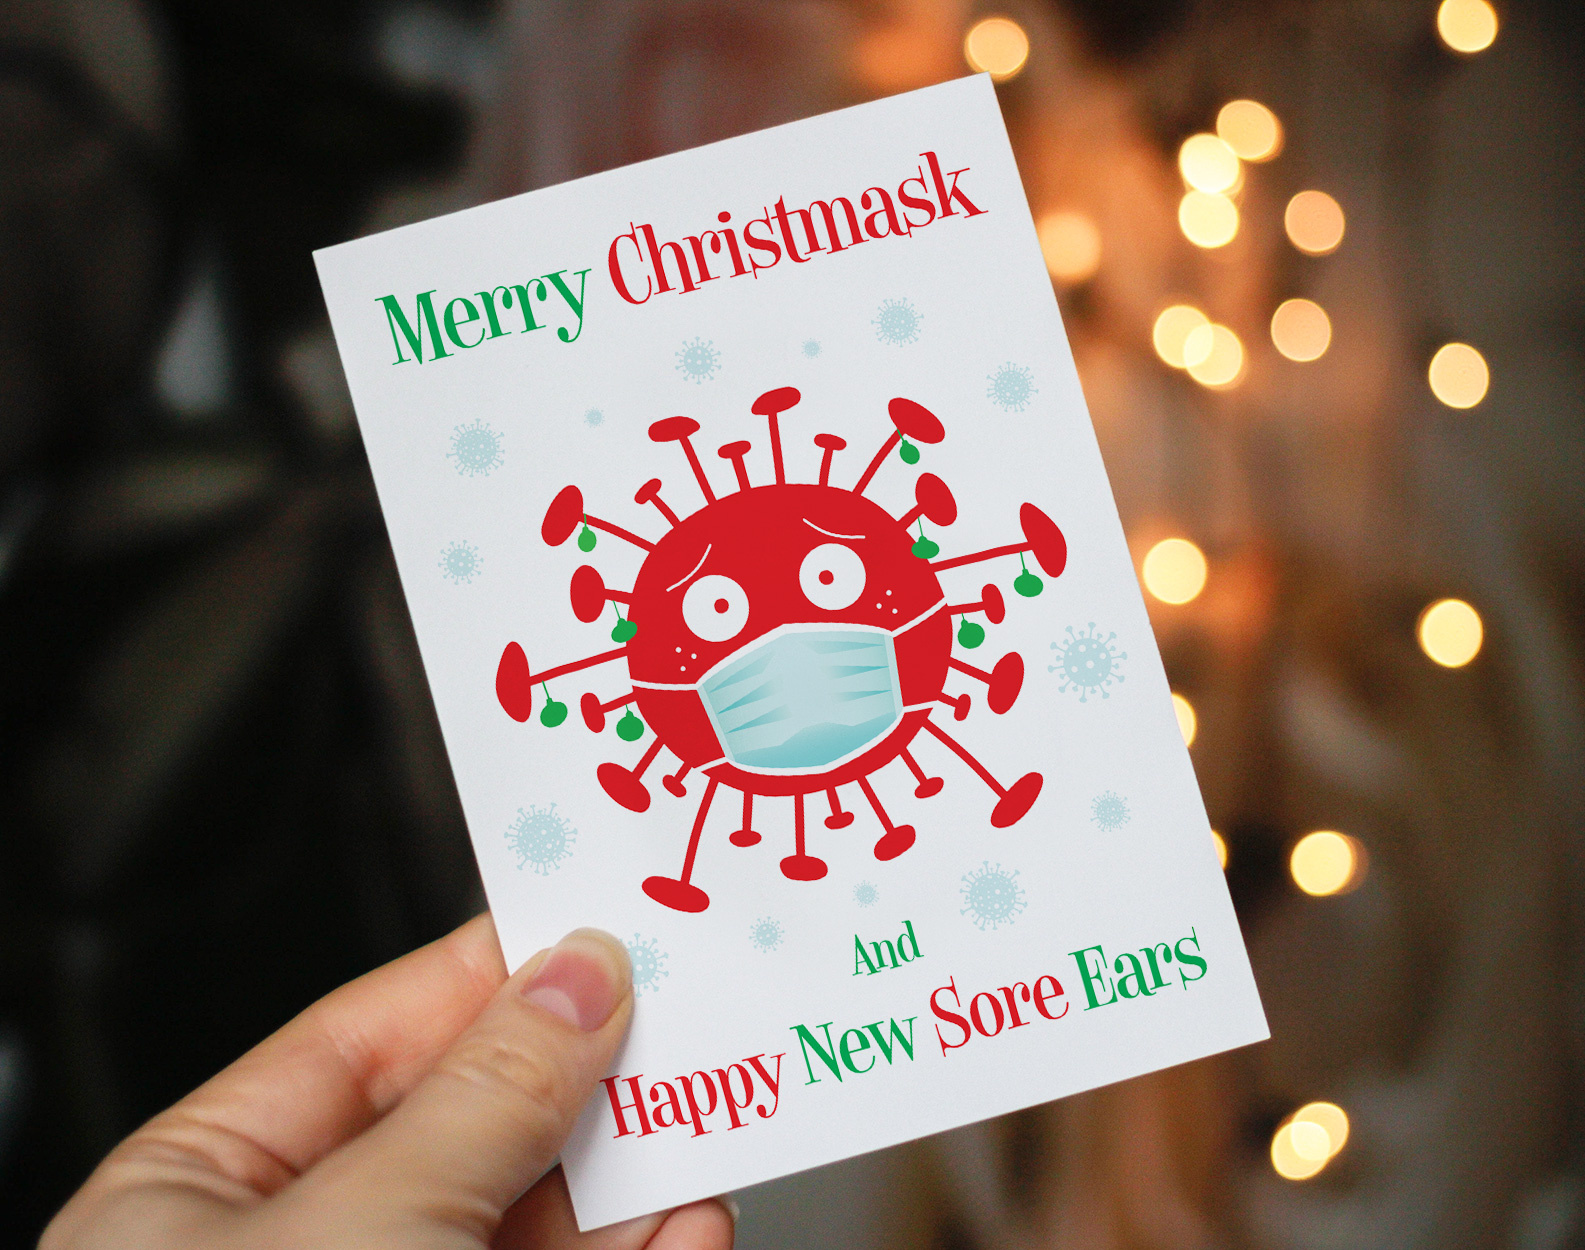 coronavirus covid lockdown quarantine mask theme funny christmas cards